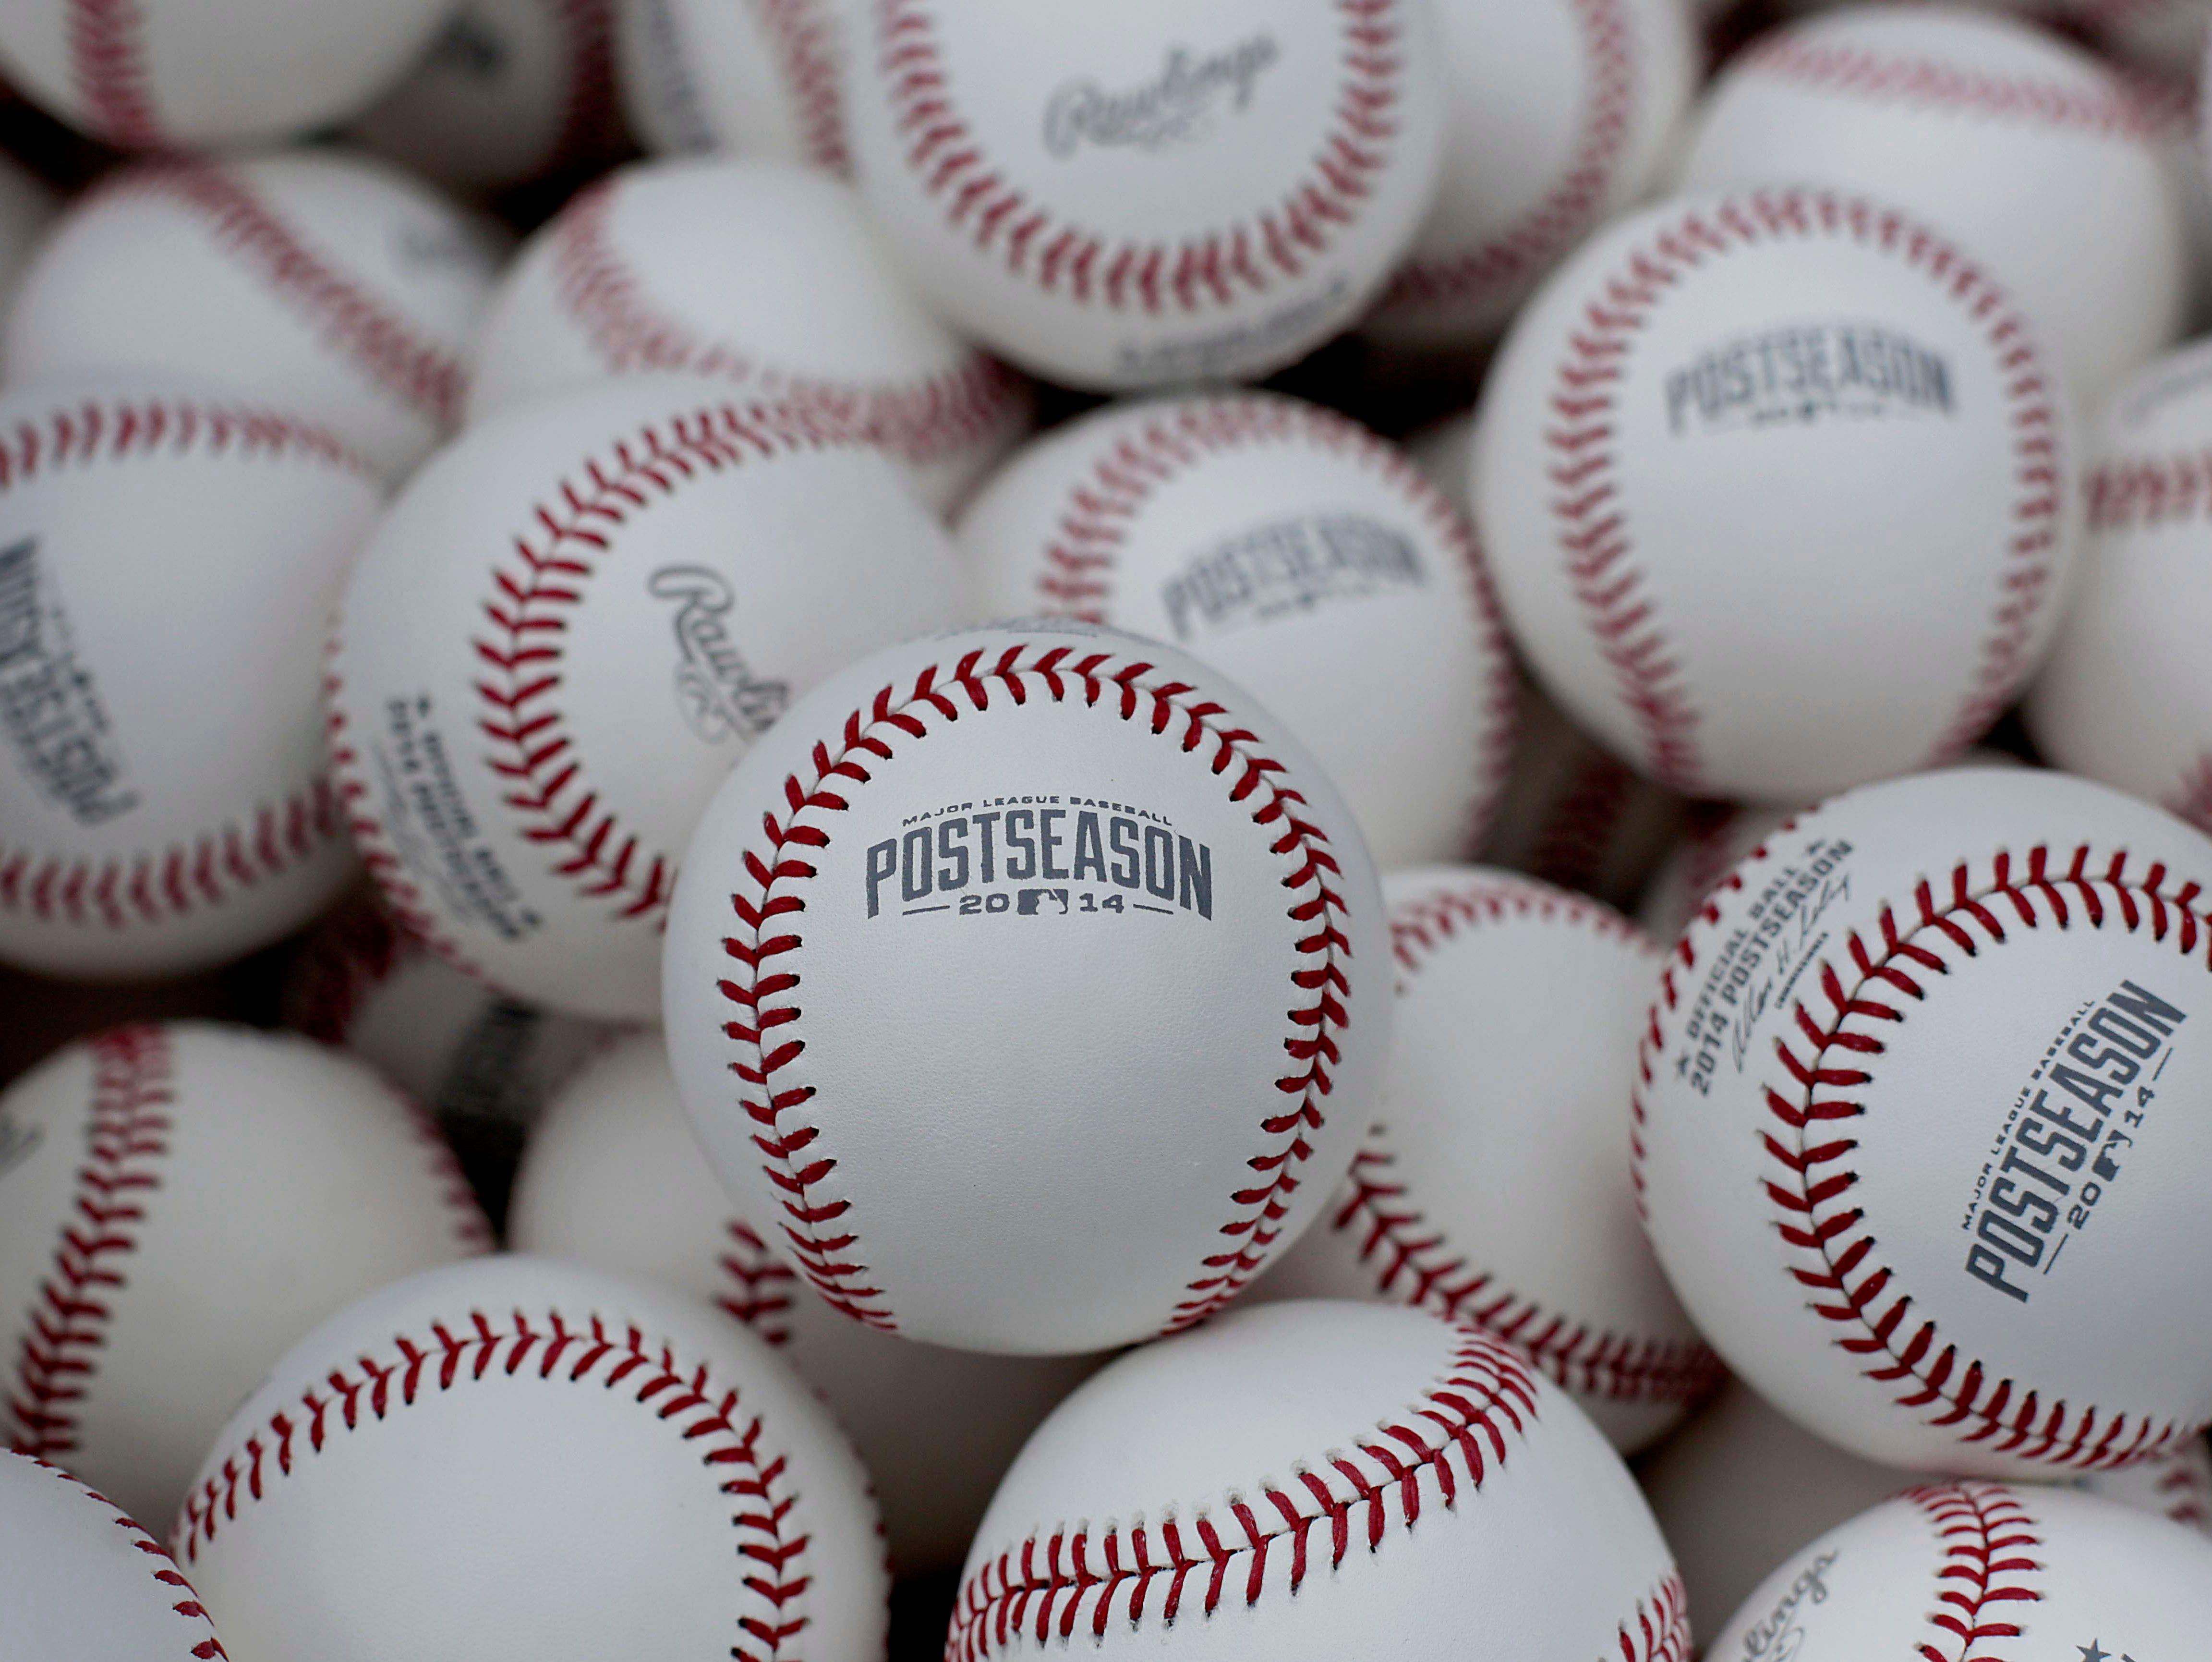 MLB postseason baseballs.